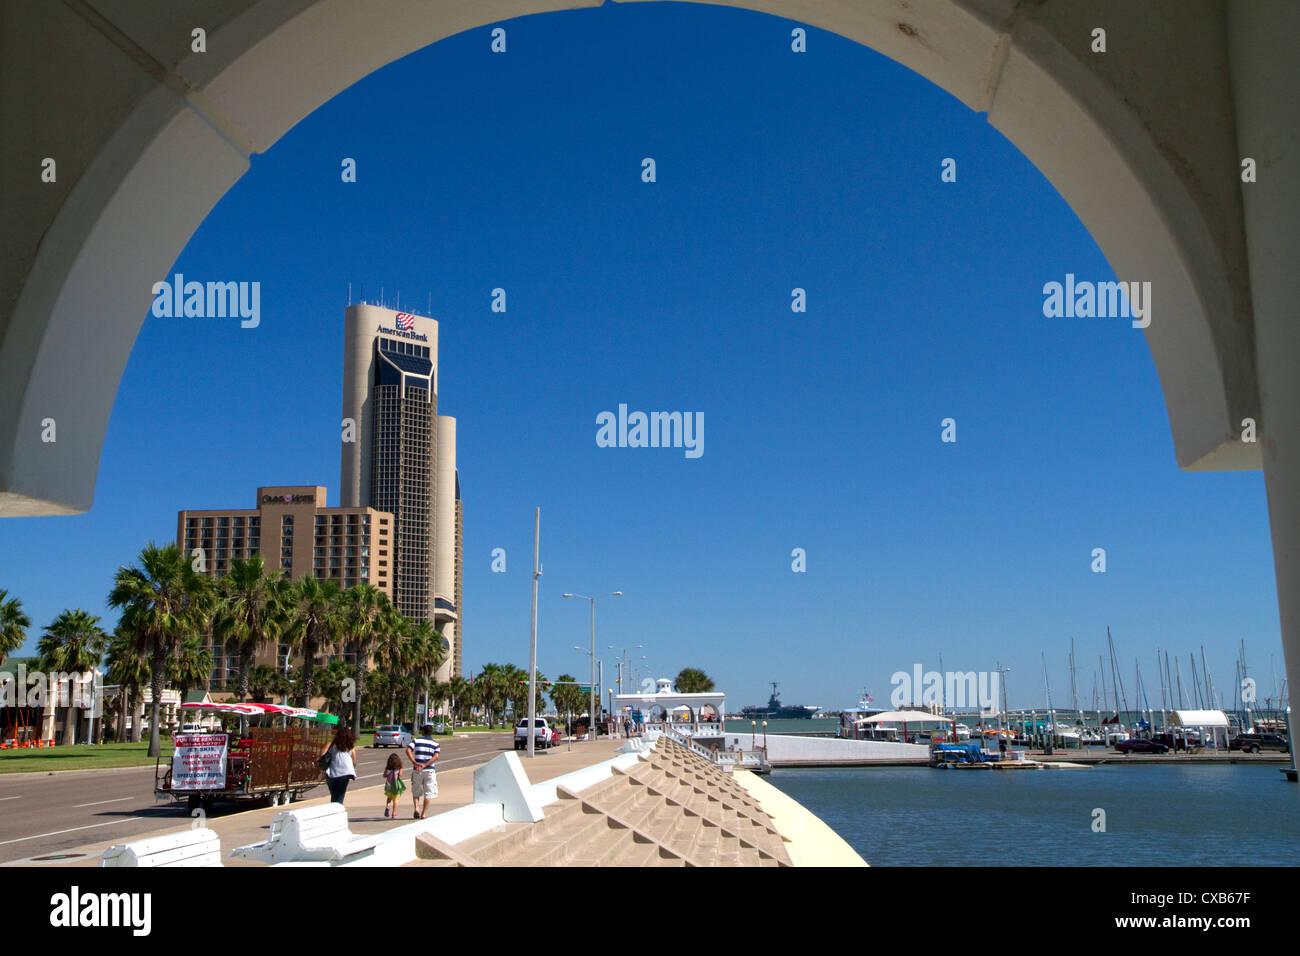 One Shoreline Plaza on the waterfront of Corpus Christi, Texas, USA. - Stock Image